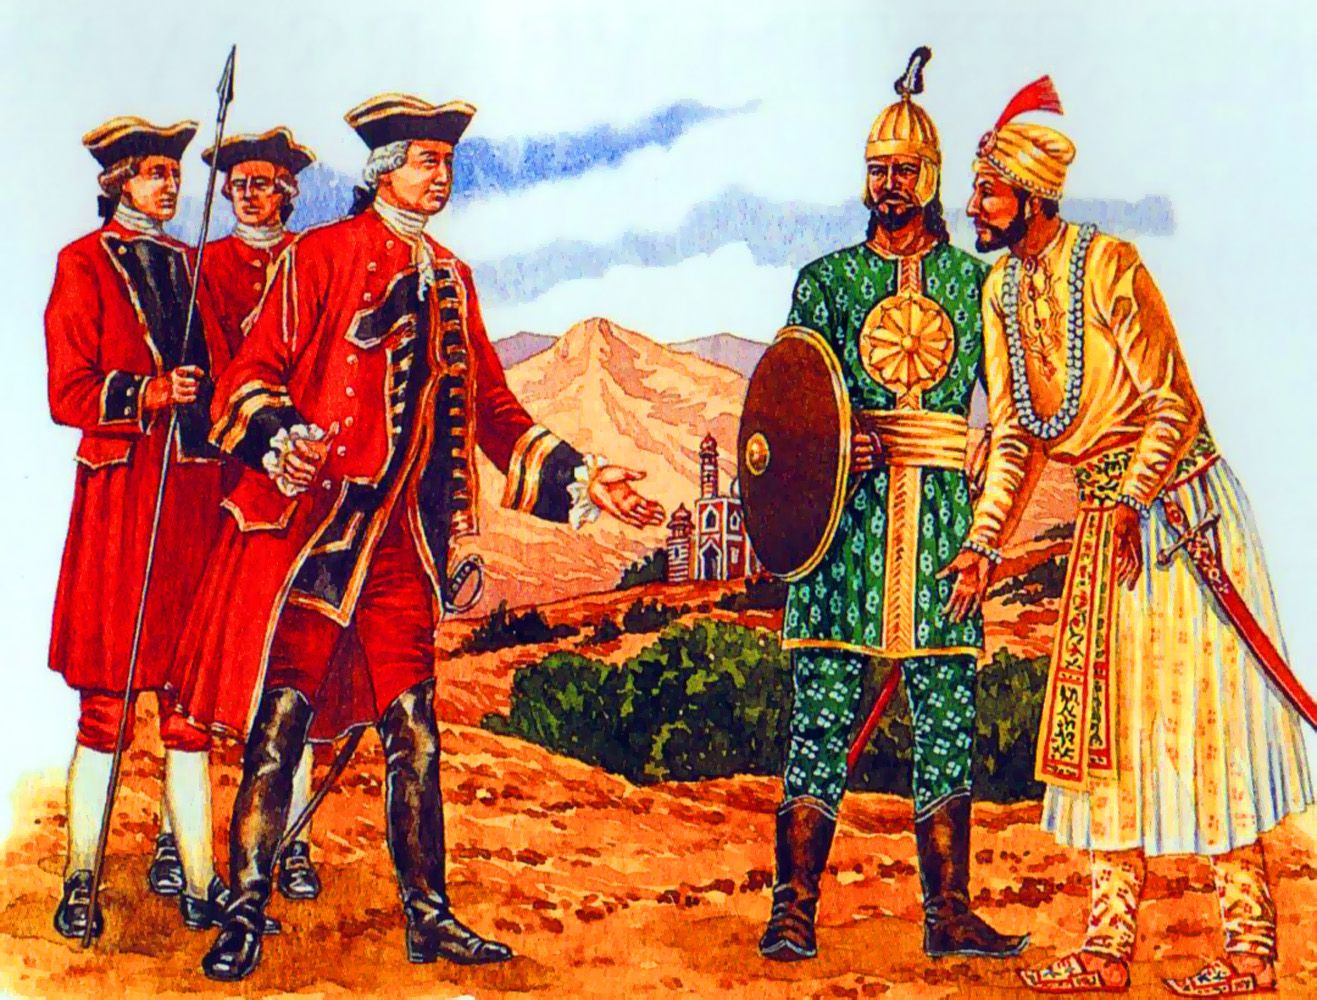 Battle of Plassey, causes of battle of plassey, battle of plassey in marathi, nawab siraj, nawab of bengal, east india company, प्लासीची लढाई, ईस्ट इंडिया कंपनी, बंगालचा नवाब